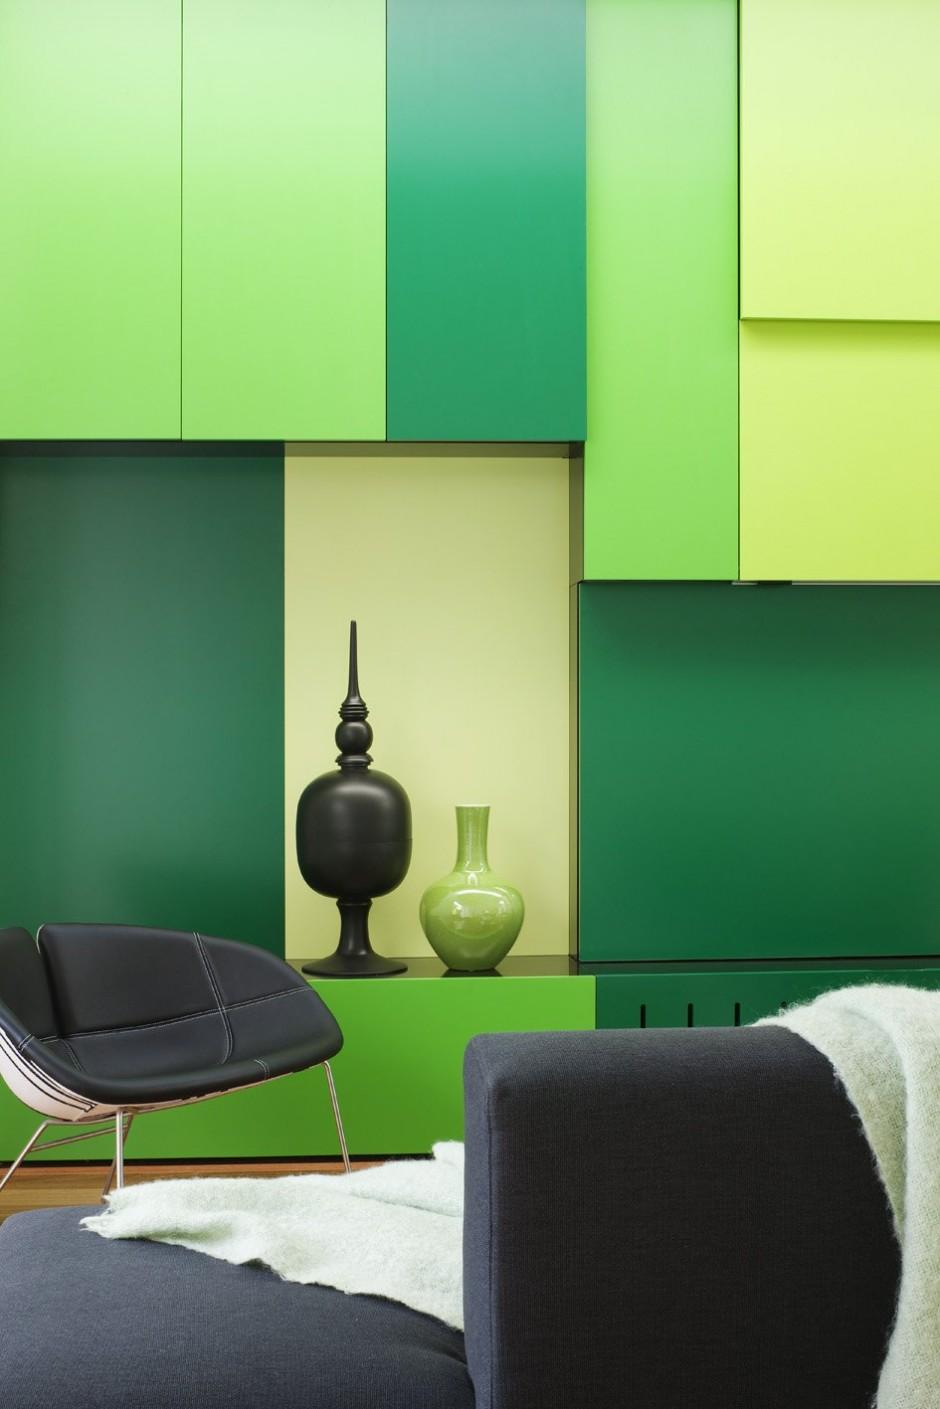 Small Minimalist Home With Creative Design - Architecture Beast